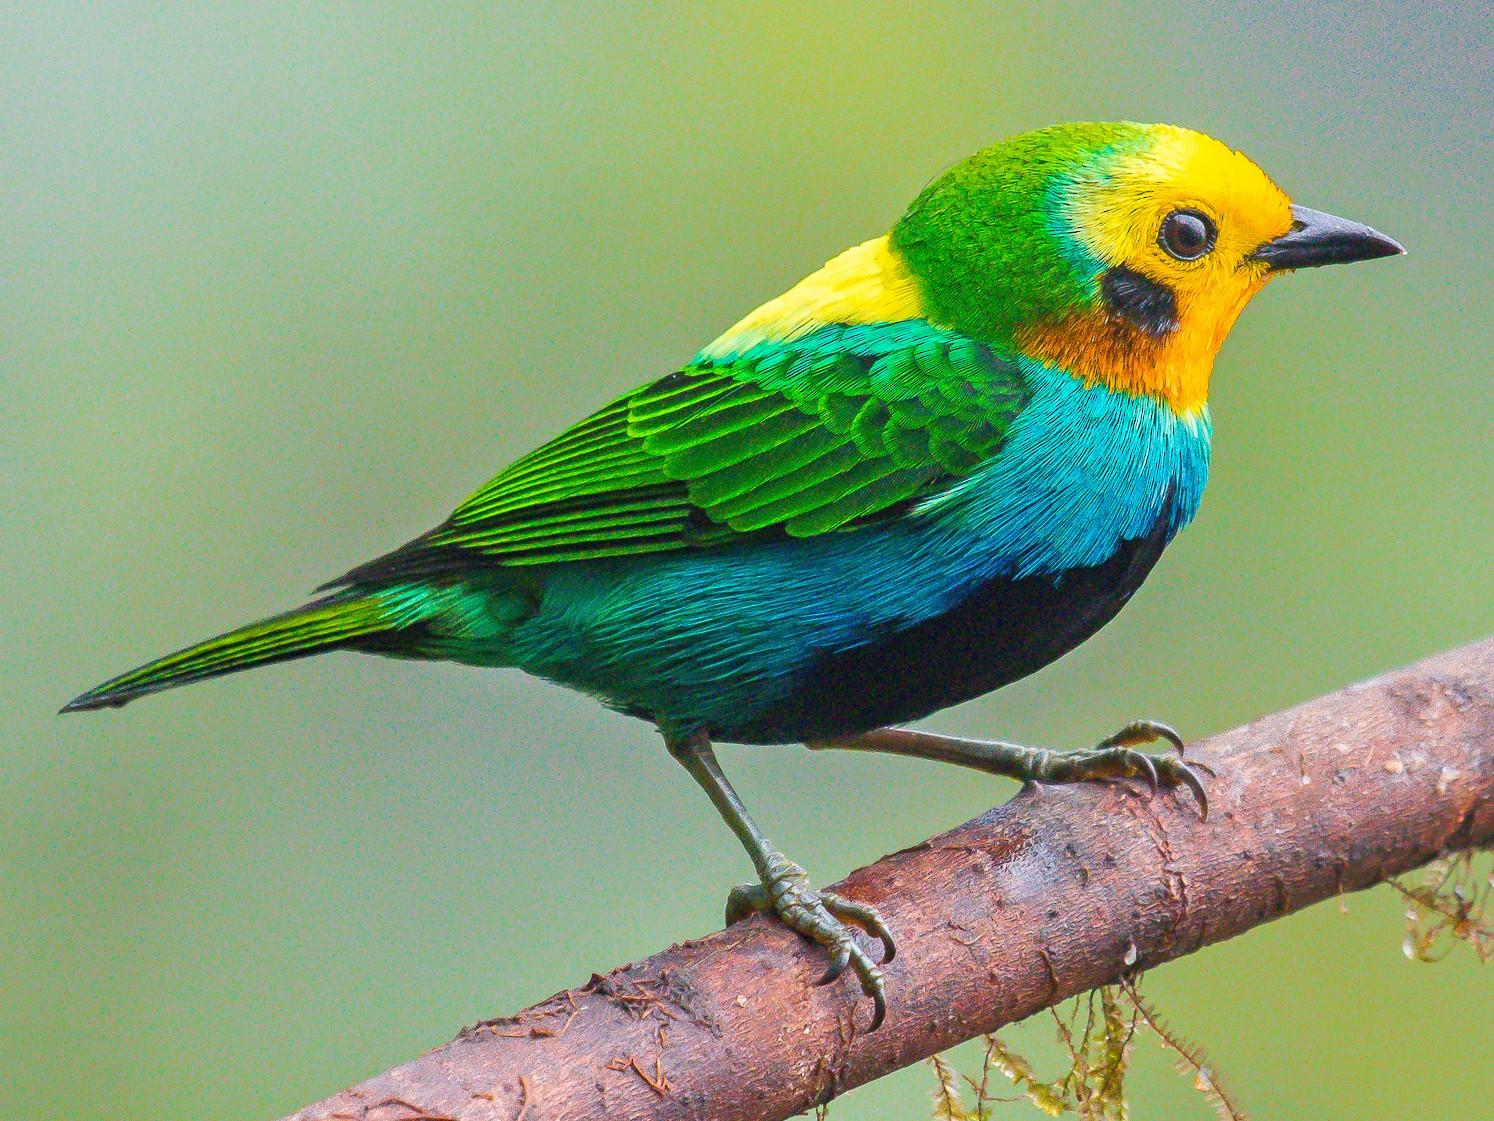 Multicolored Tanager - David Monroy Rengifo